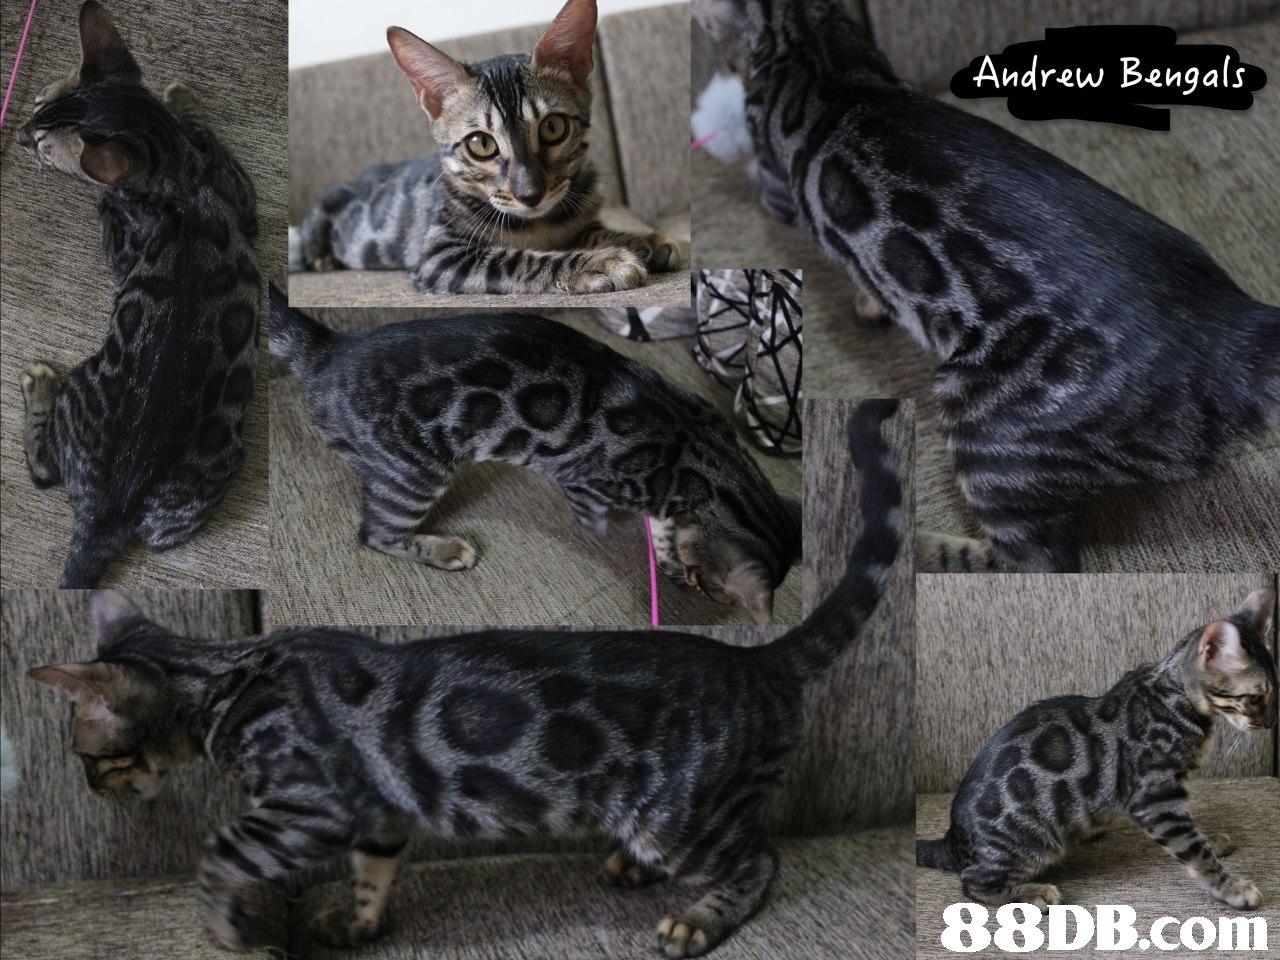 Andrew Bengals,cat,mammal,small to medium sized cats,cat like mammal,vertebrate